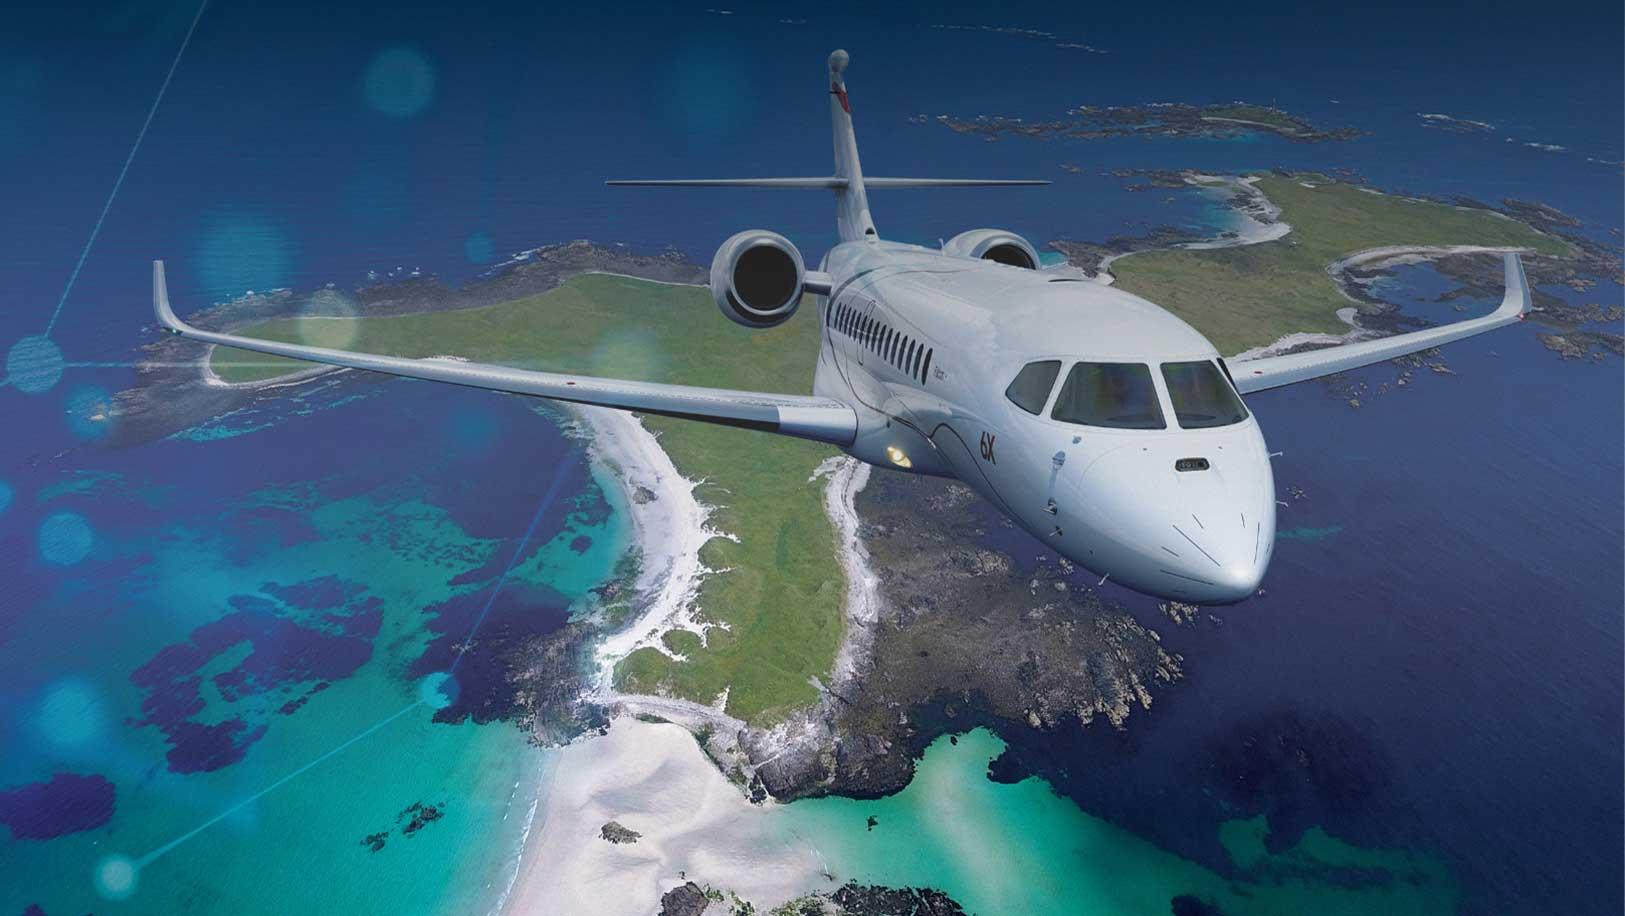 dassault 6x jet flying